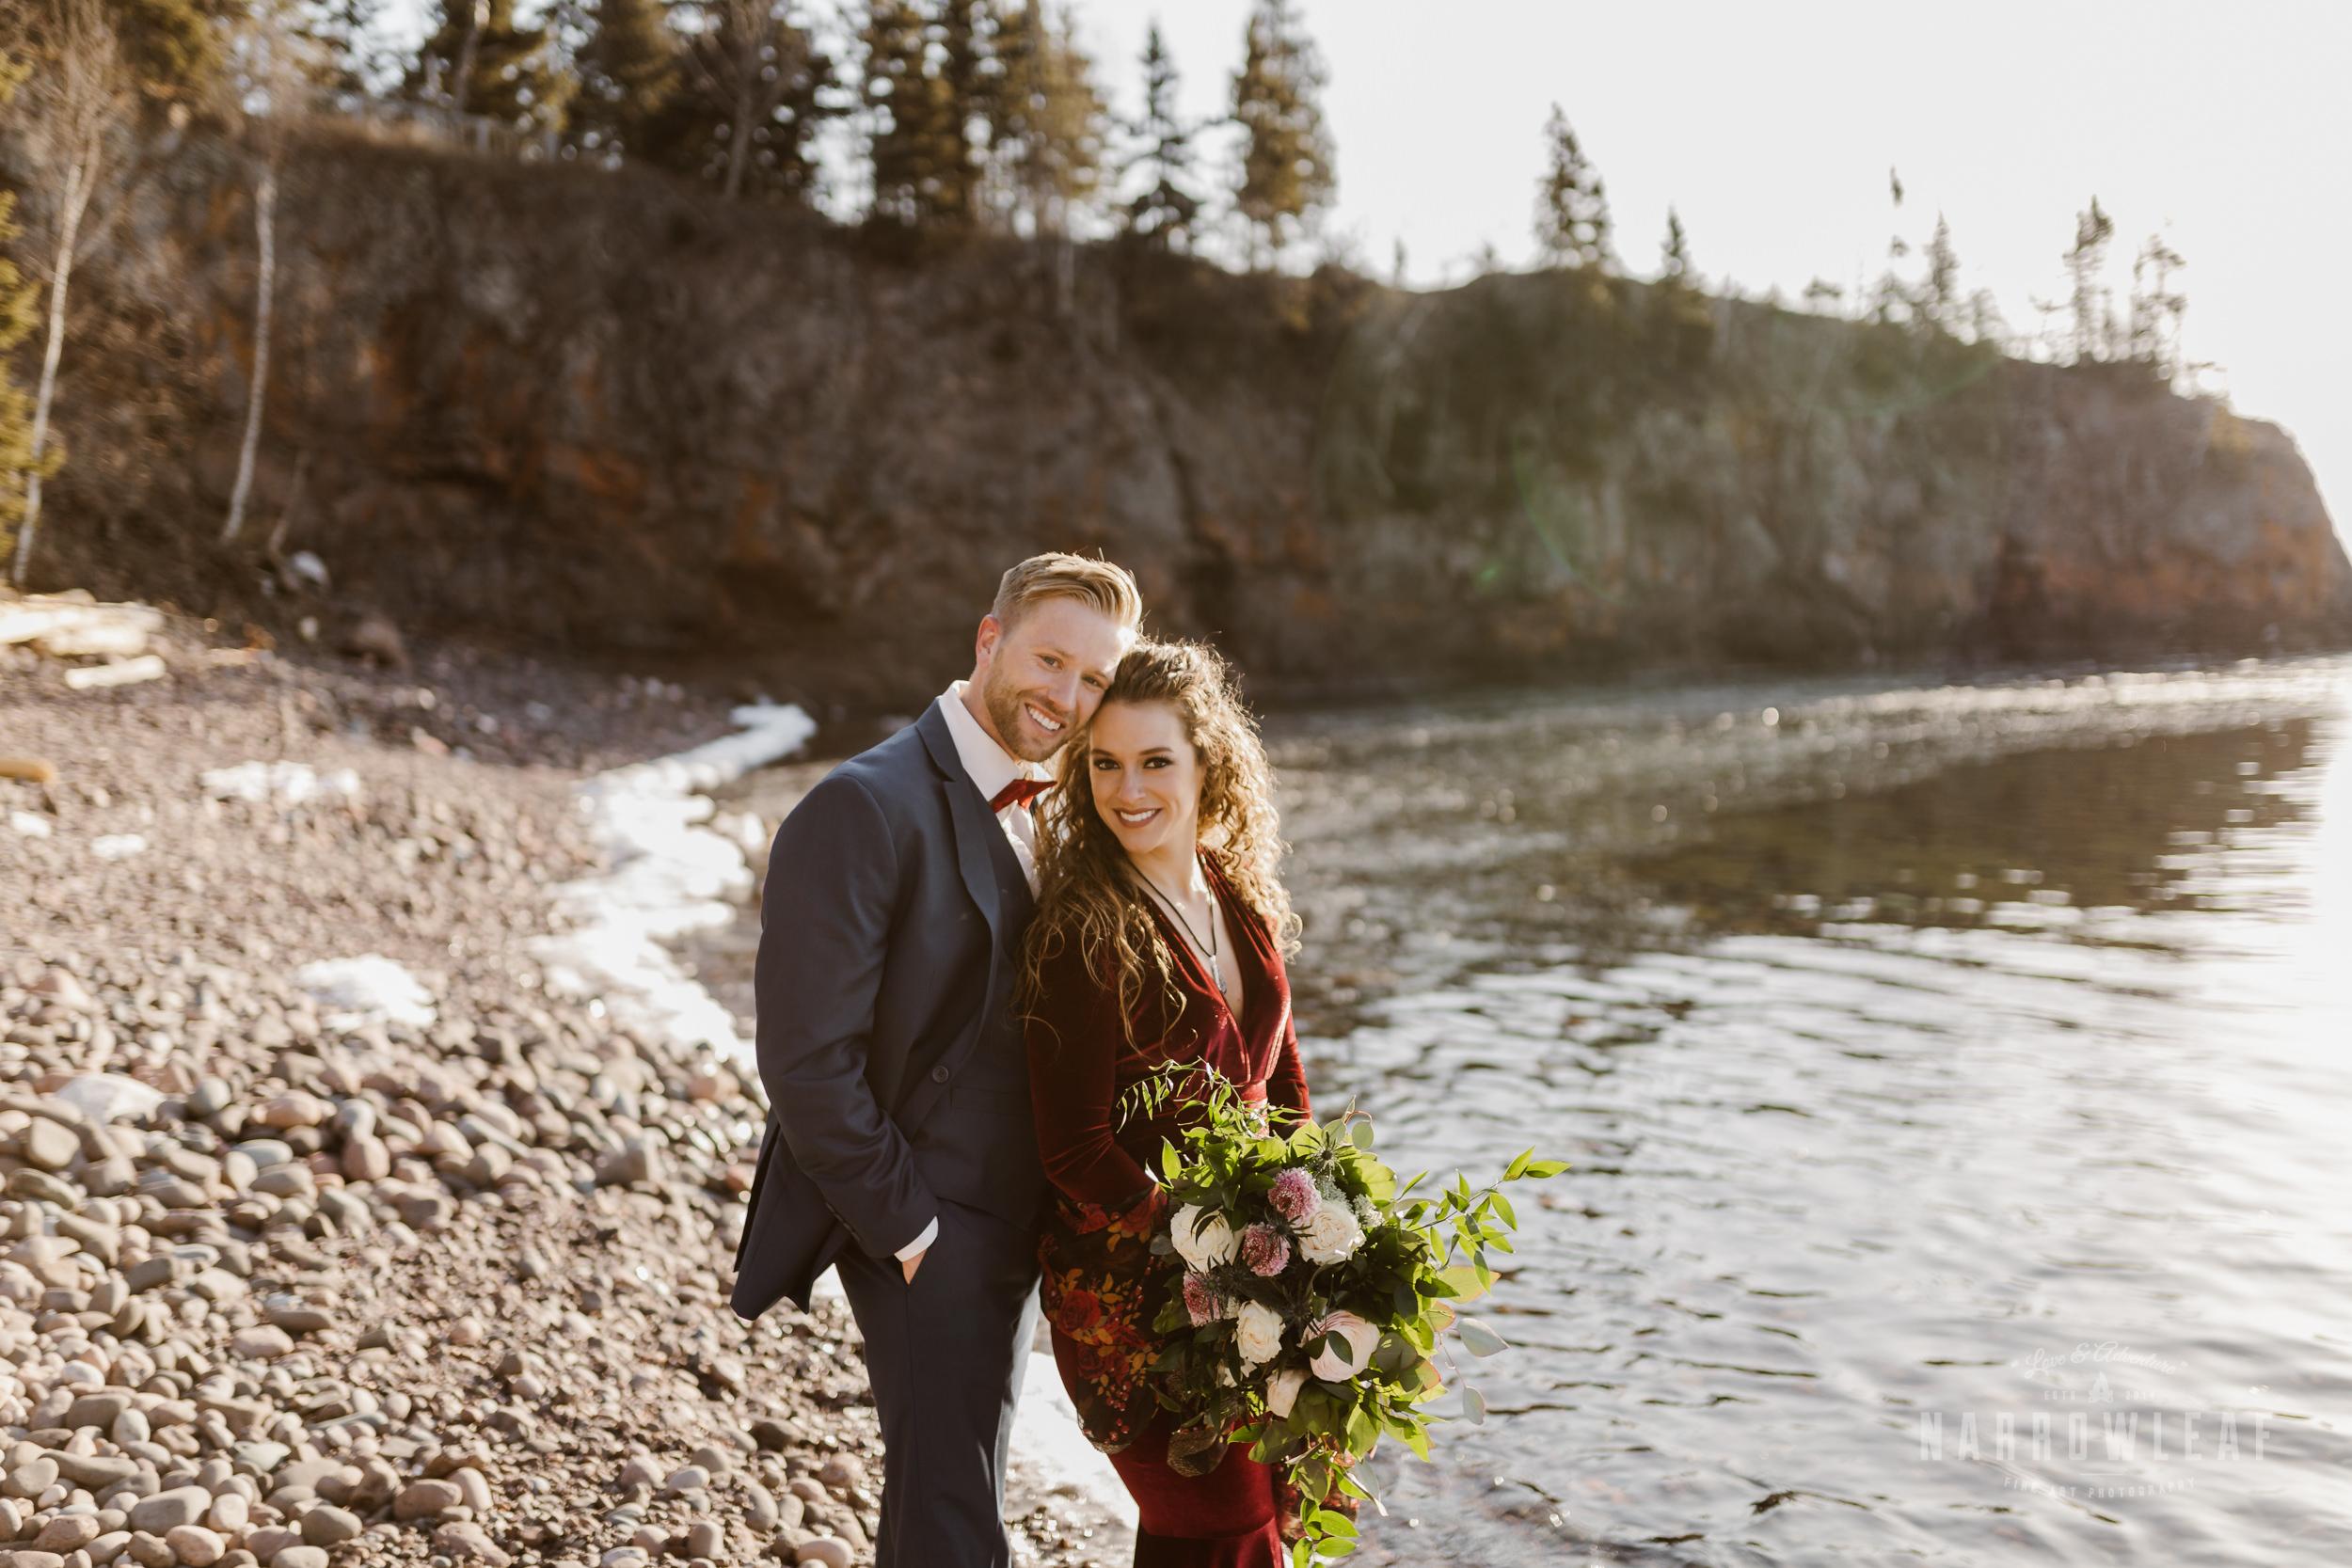 minnesota-adventure-elopement-Narrowleaf_Love_and_Adventure_Photography-8932.jpg